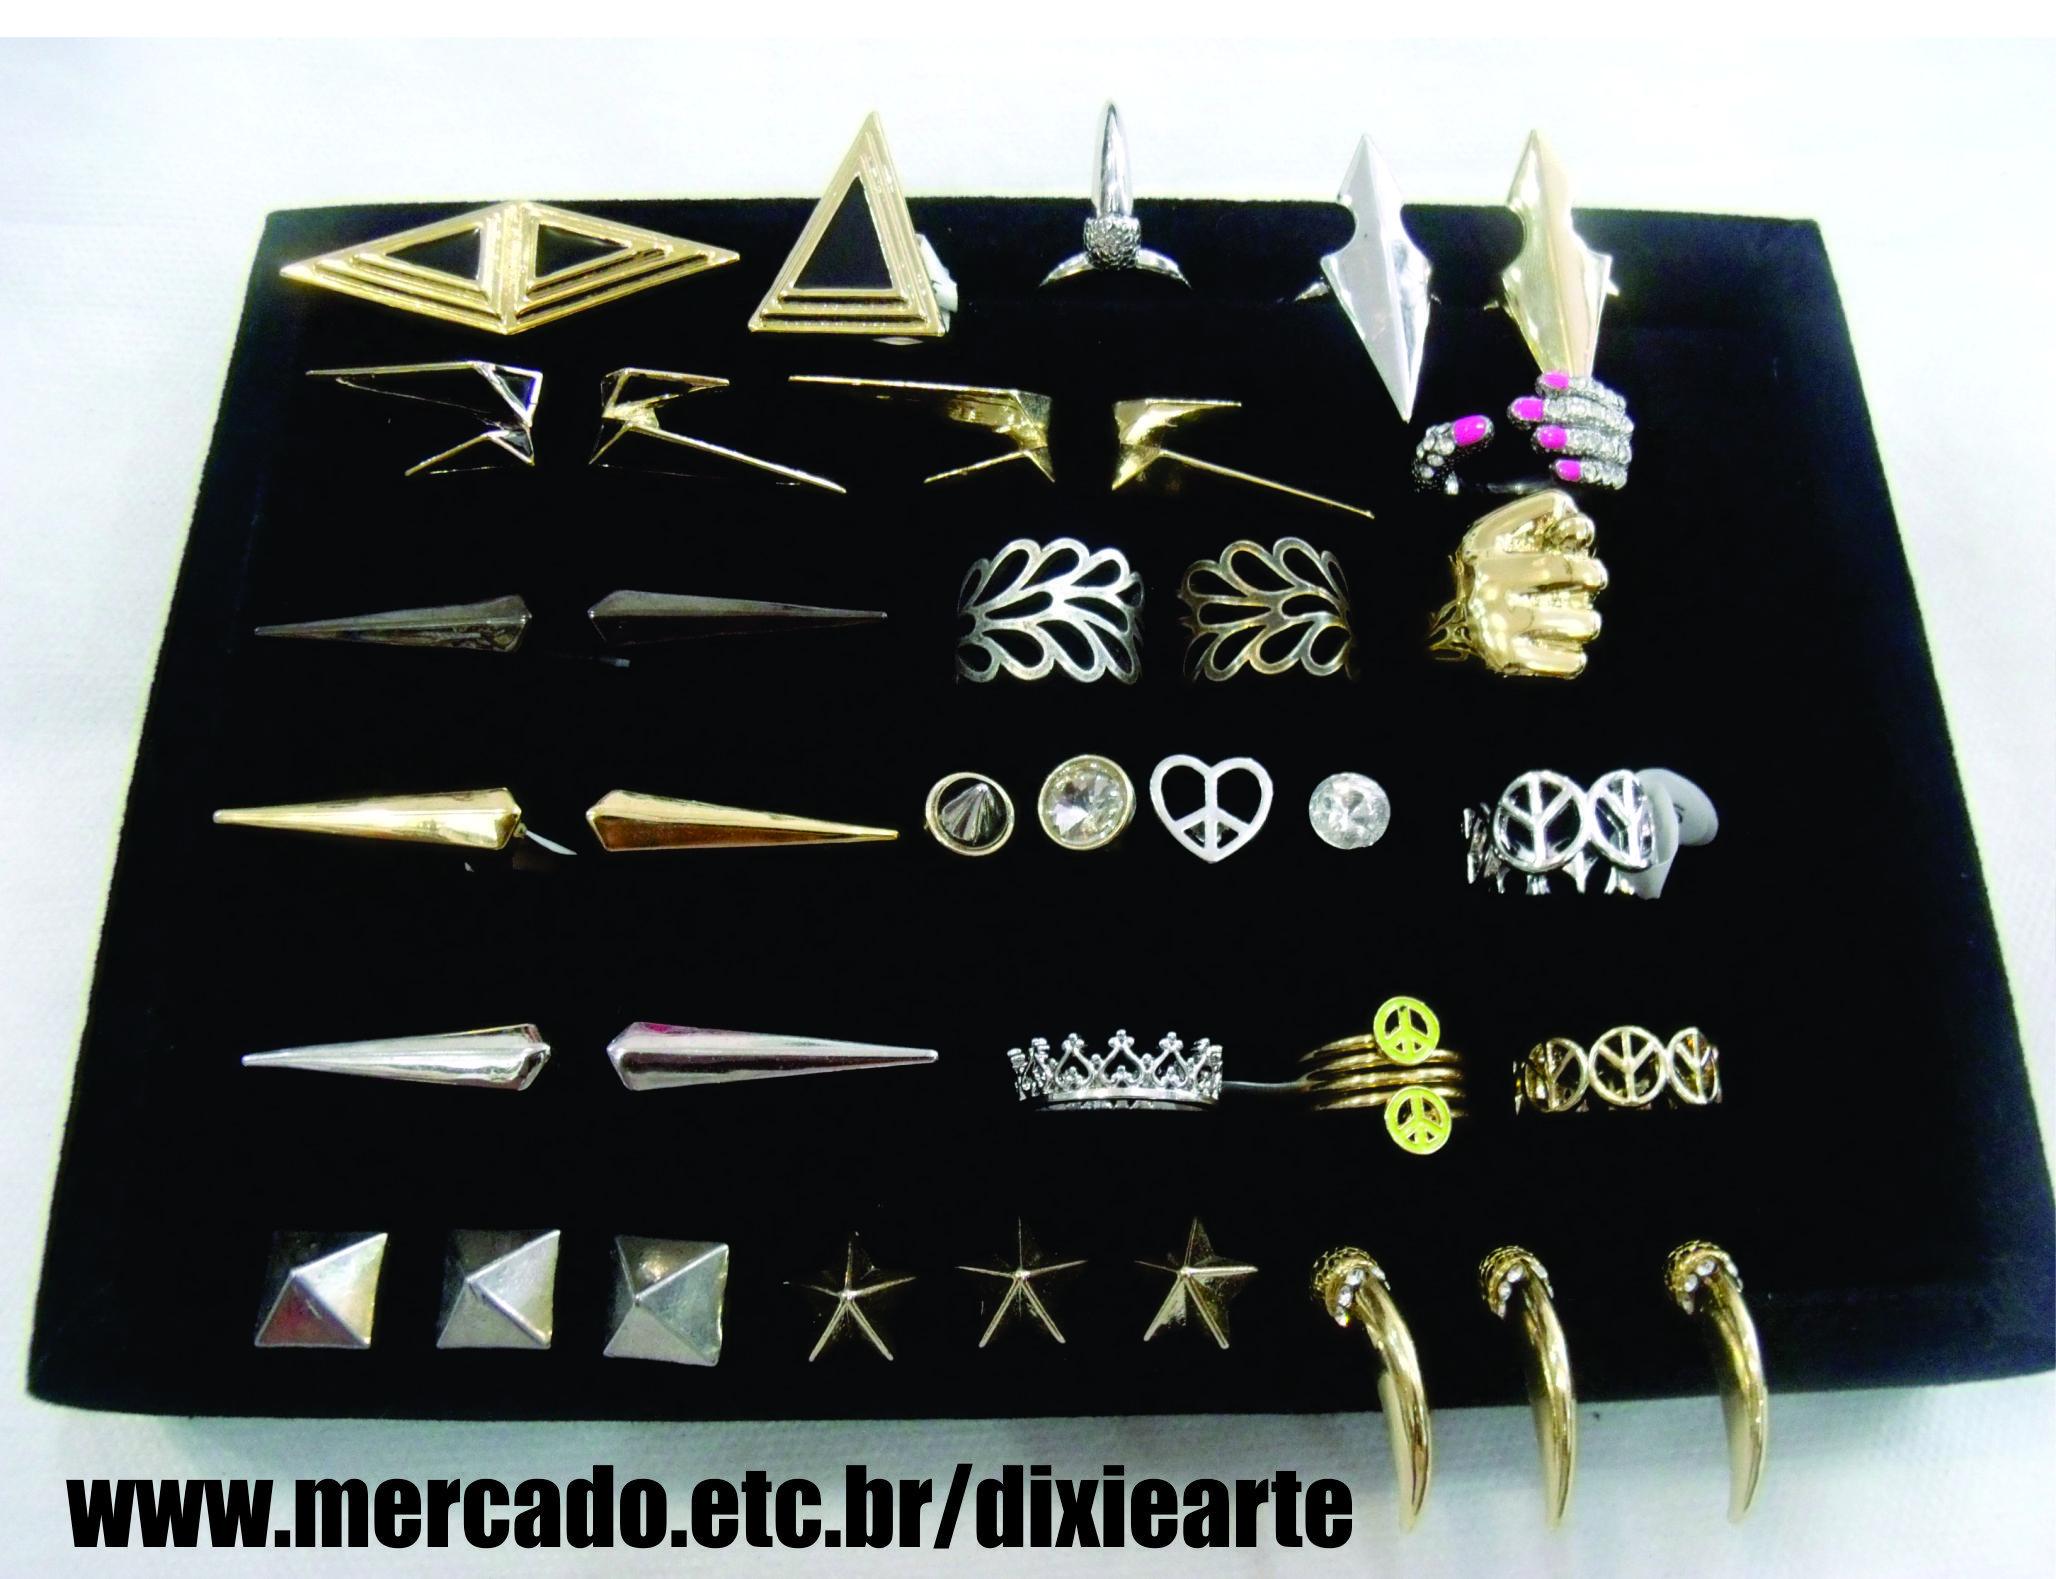 Anéis Dixie Arte e Estilo   www.mercado.etc.br/dixiearte